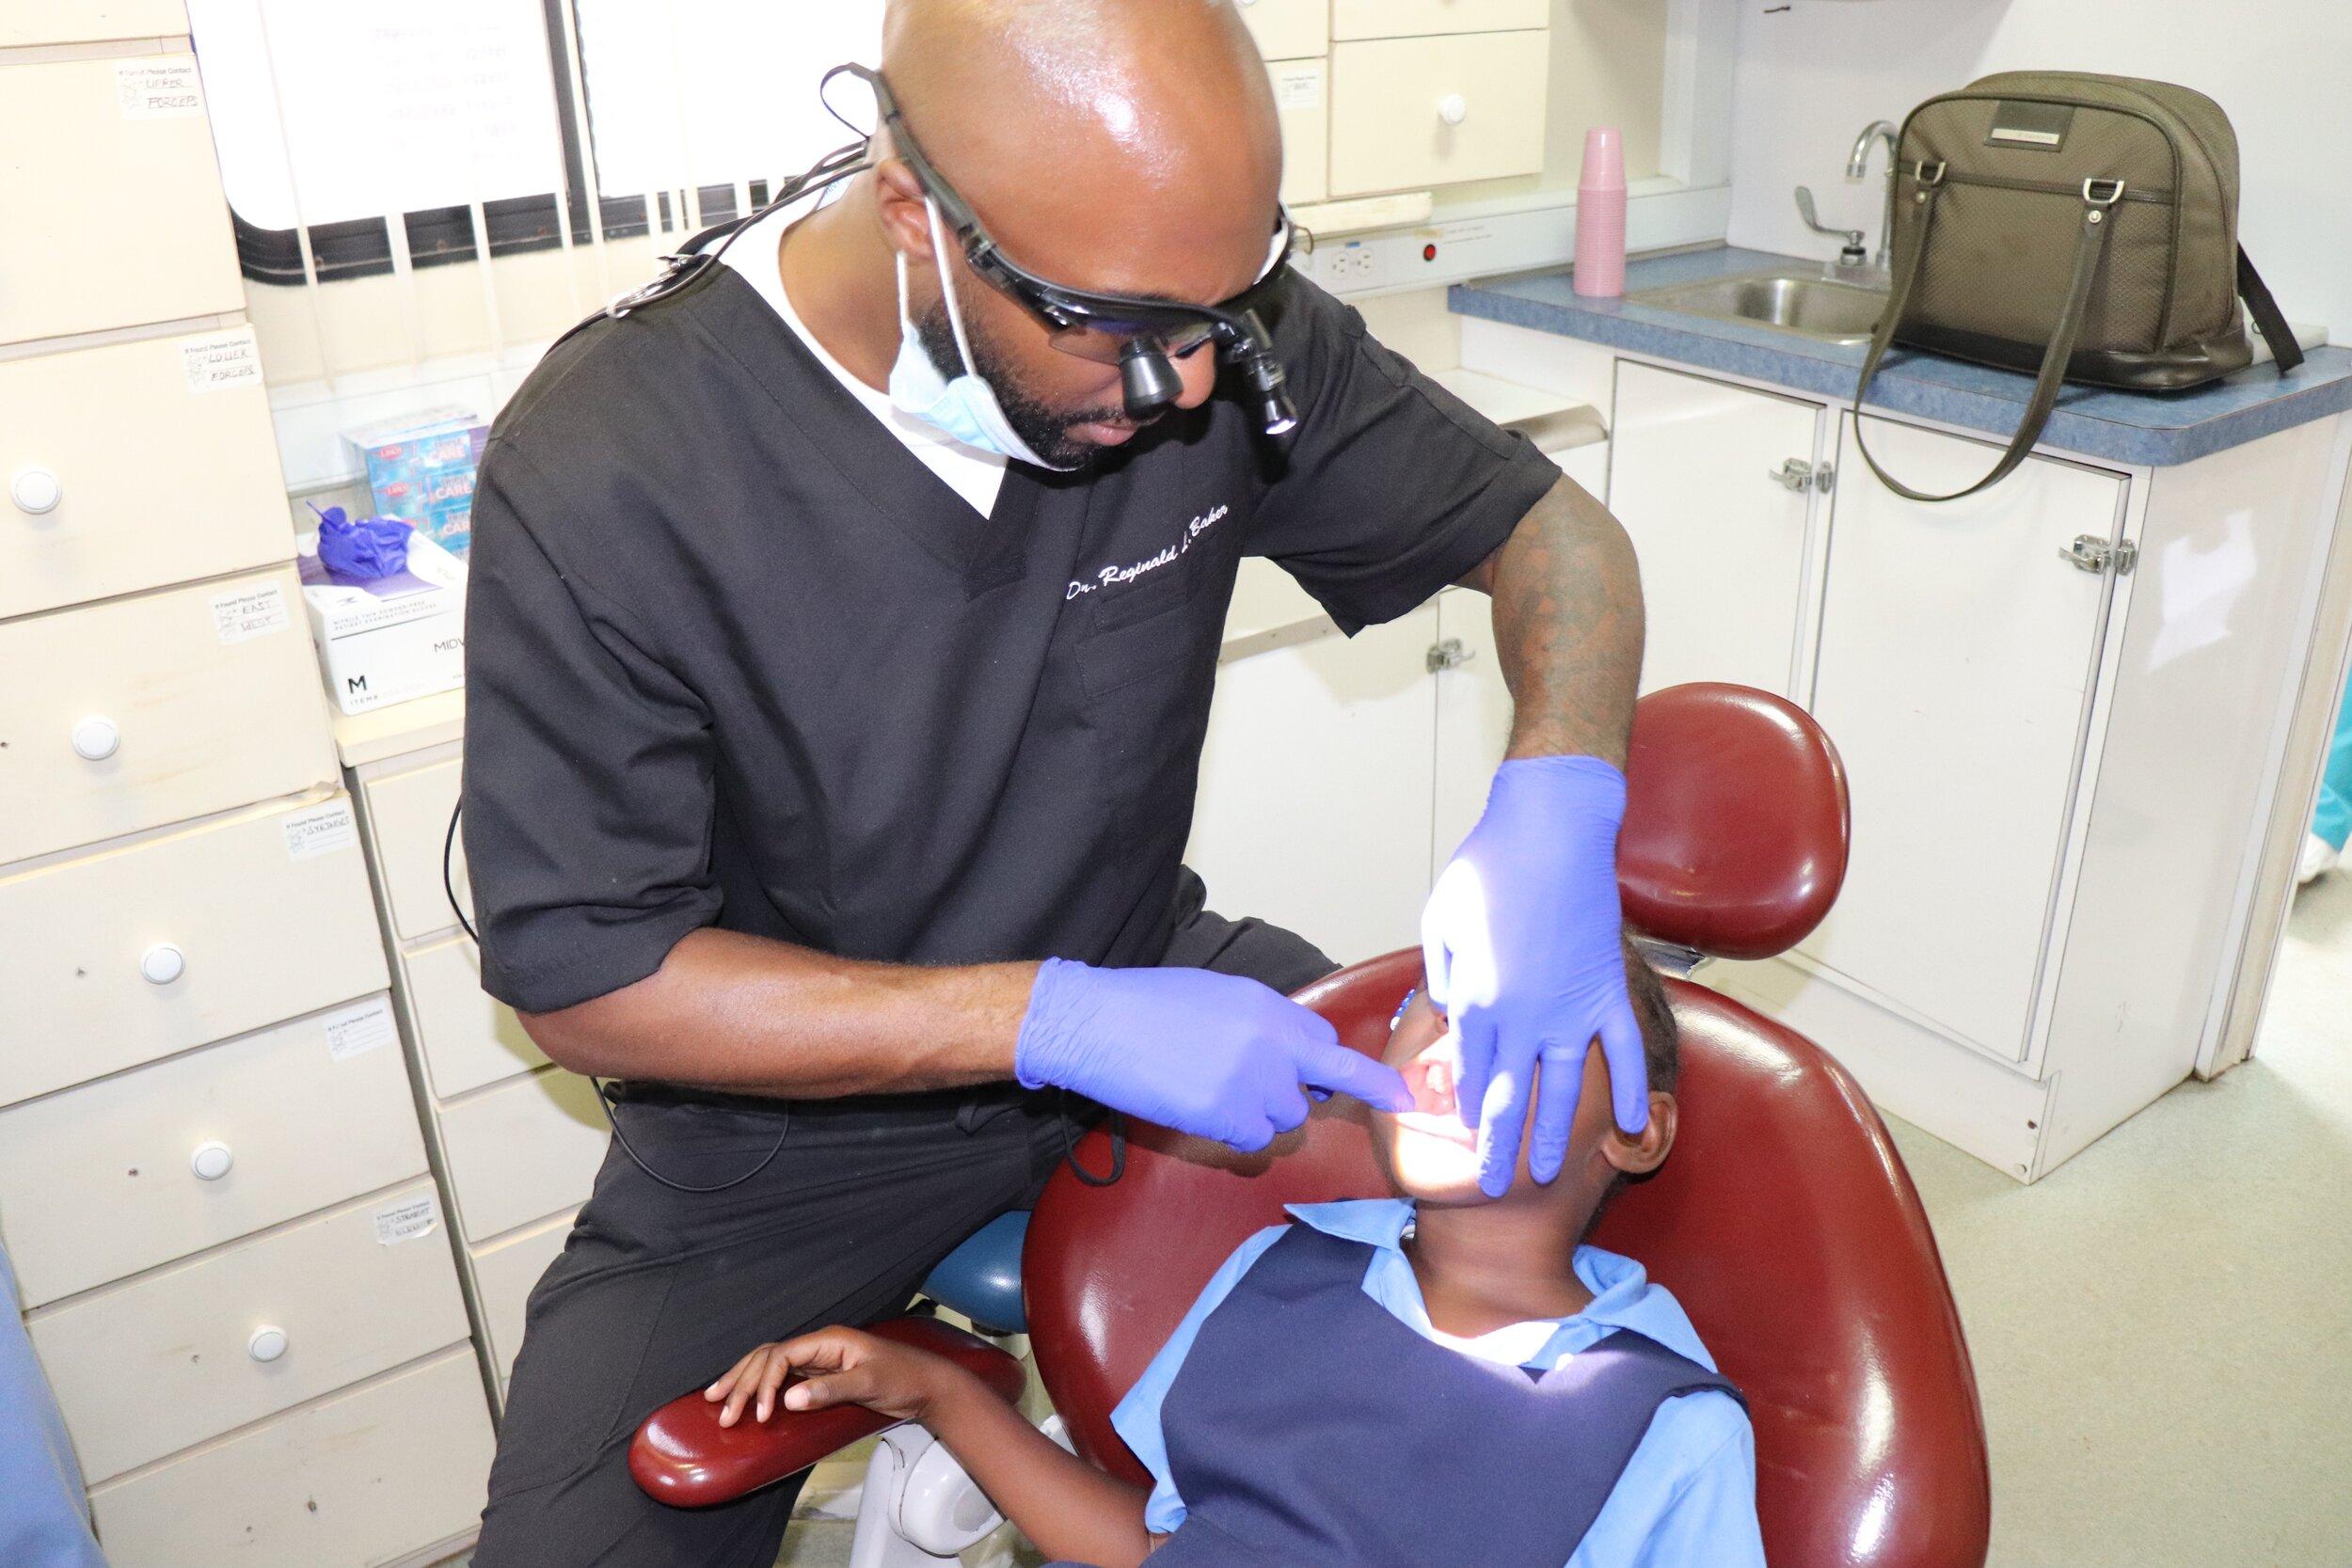 Dr. Baker performing examination